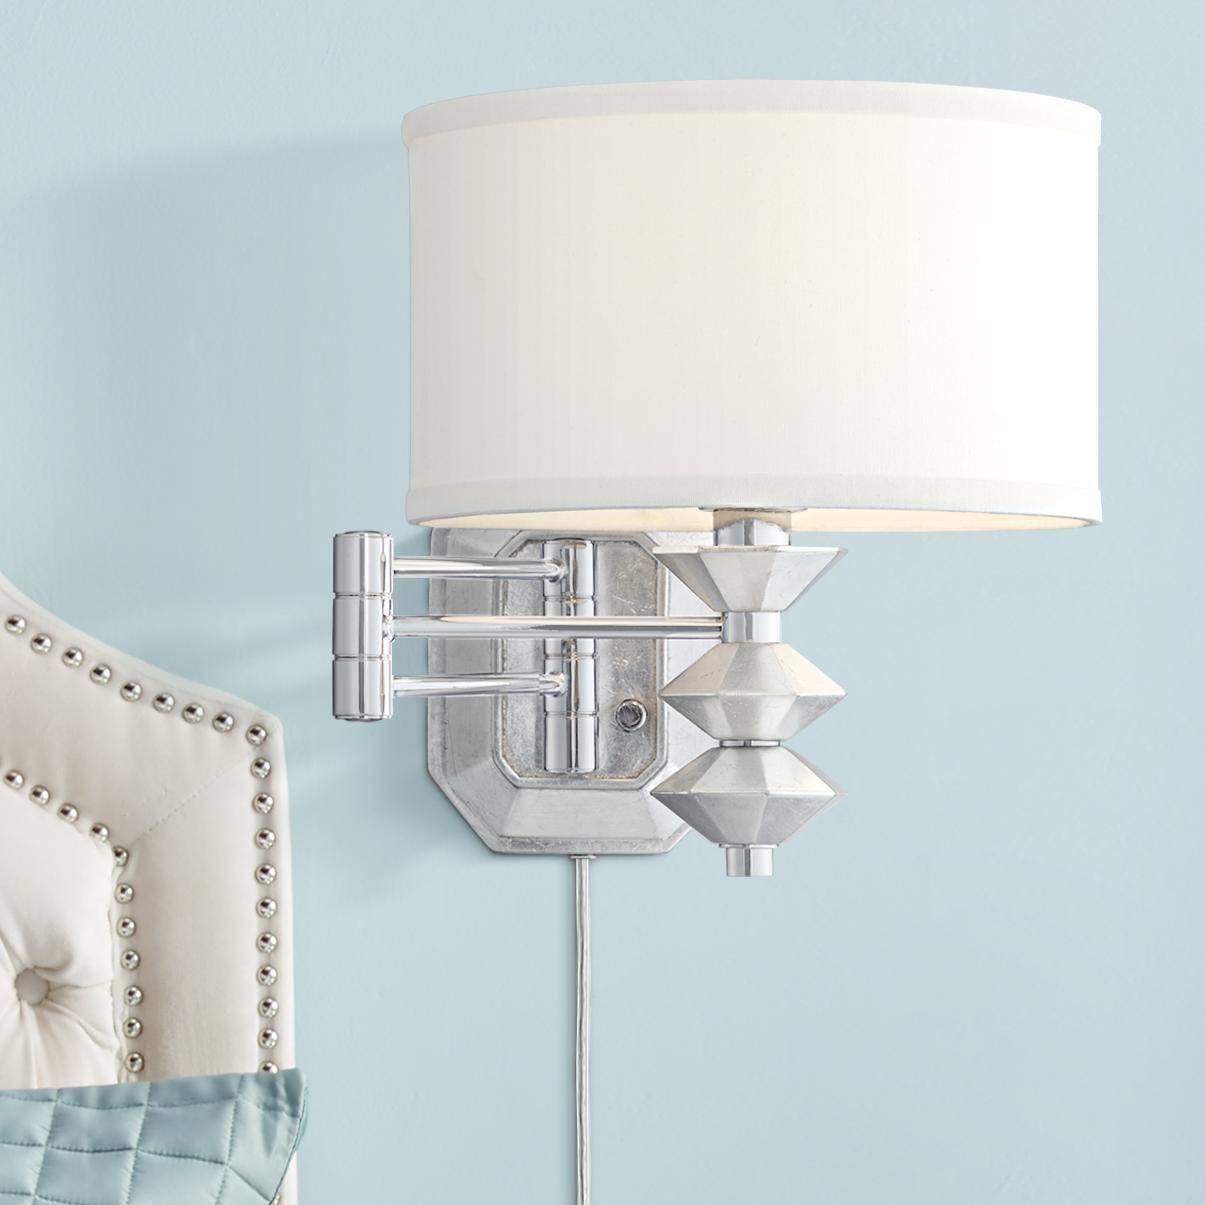 Wall Lamps Possini Euro Currie Chrome Swing Arm Wall Lamp In 2020 Swing Arm Wall Lamps Wall Lamp Wall Lamp Design